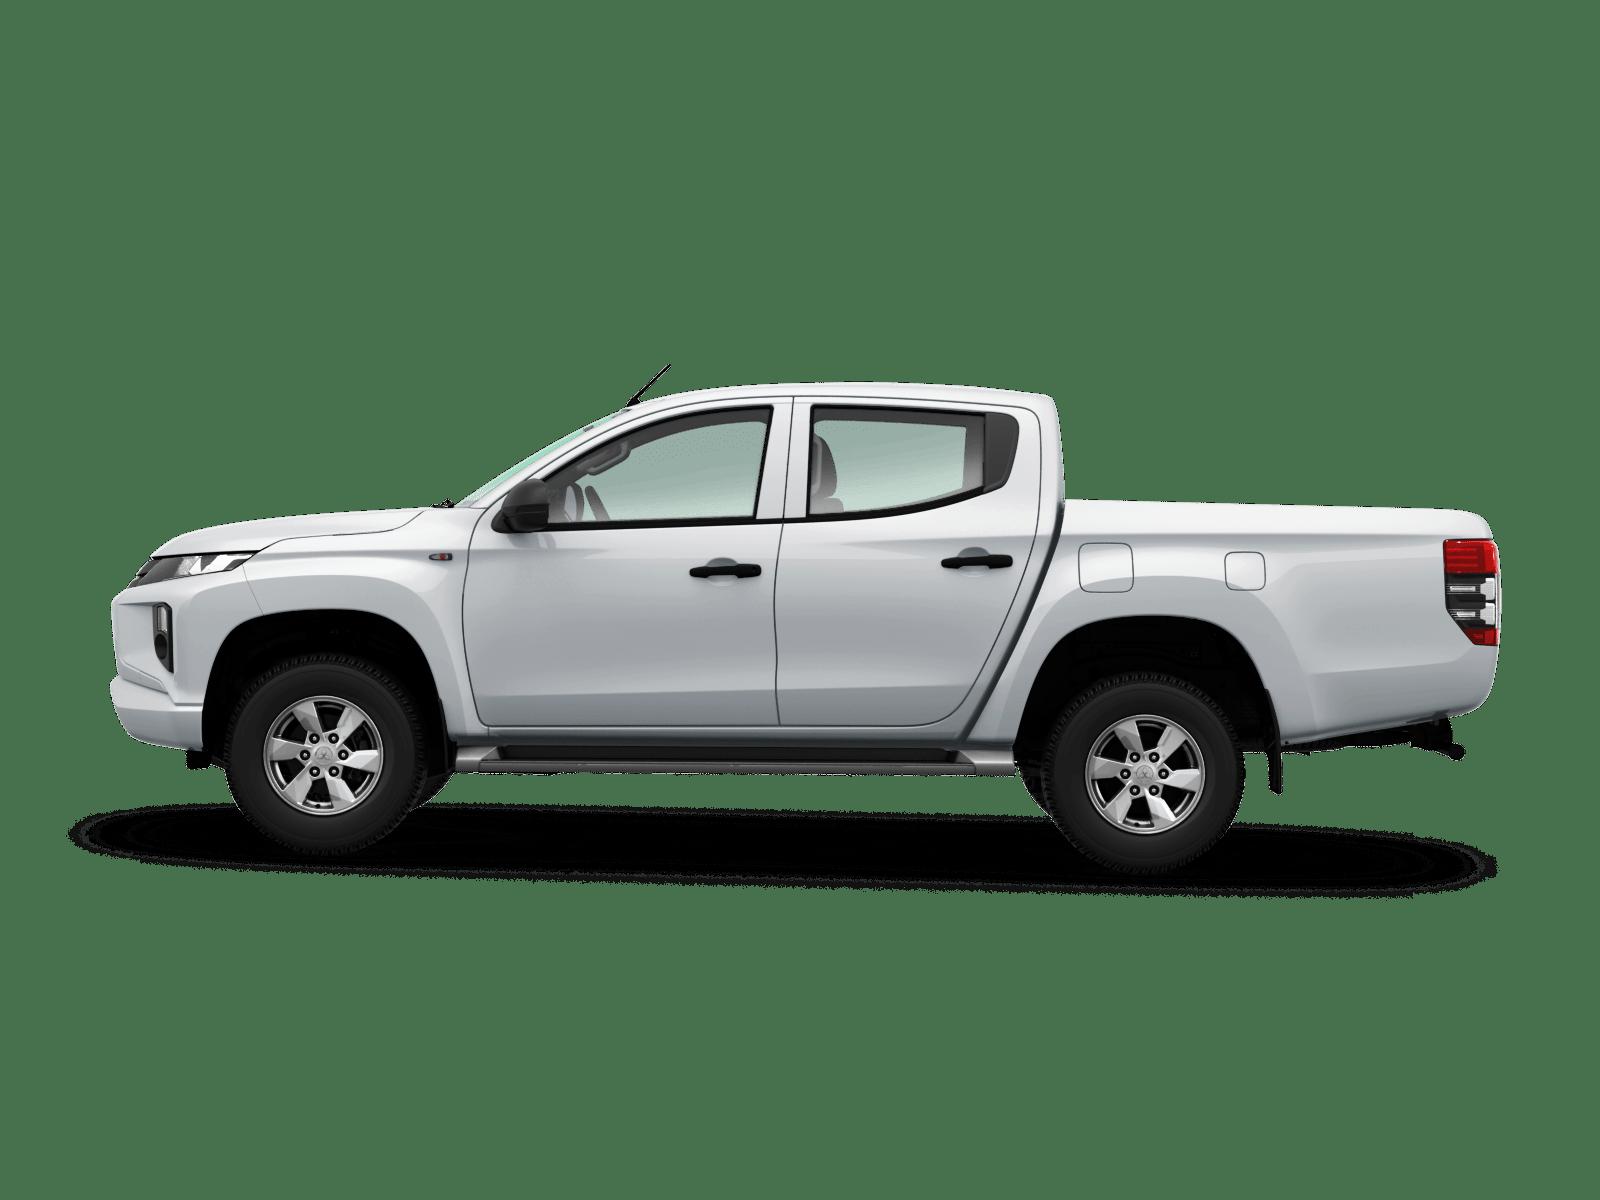 2020 Mitsubishi L200 Release Date and Concept